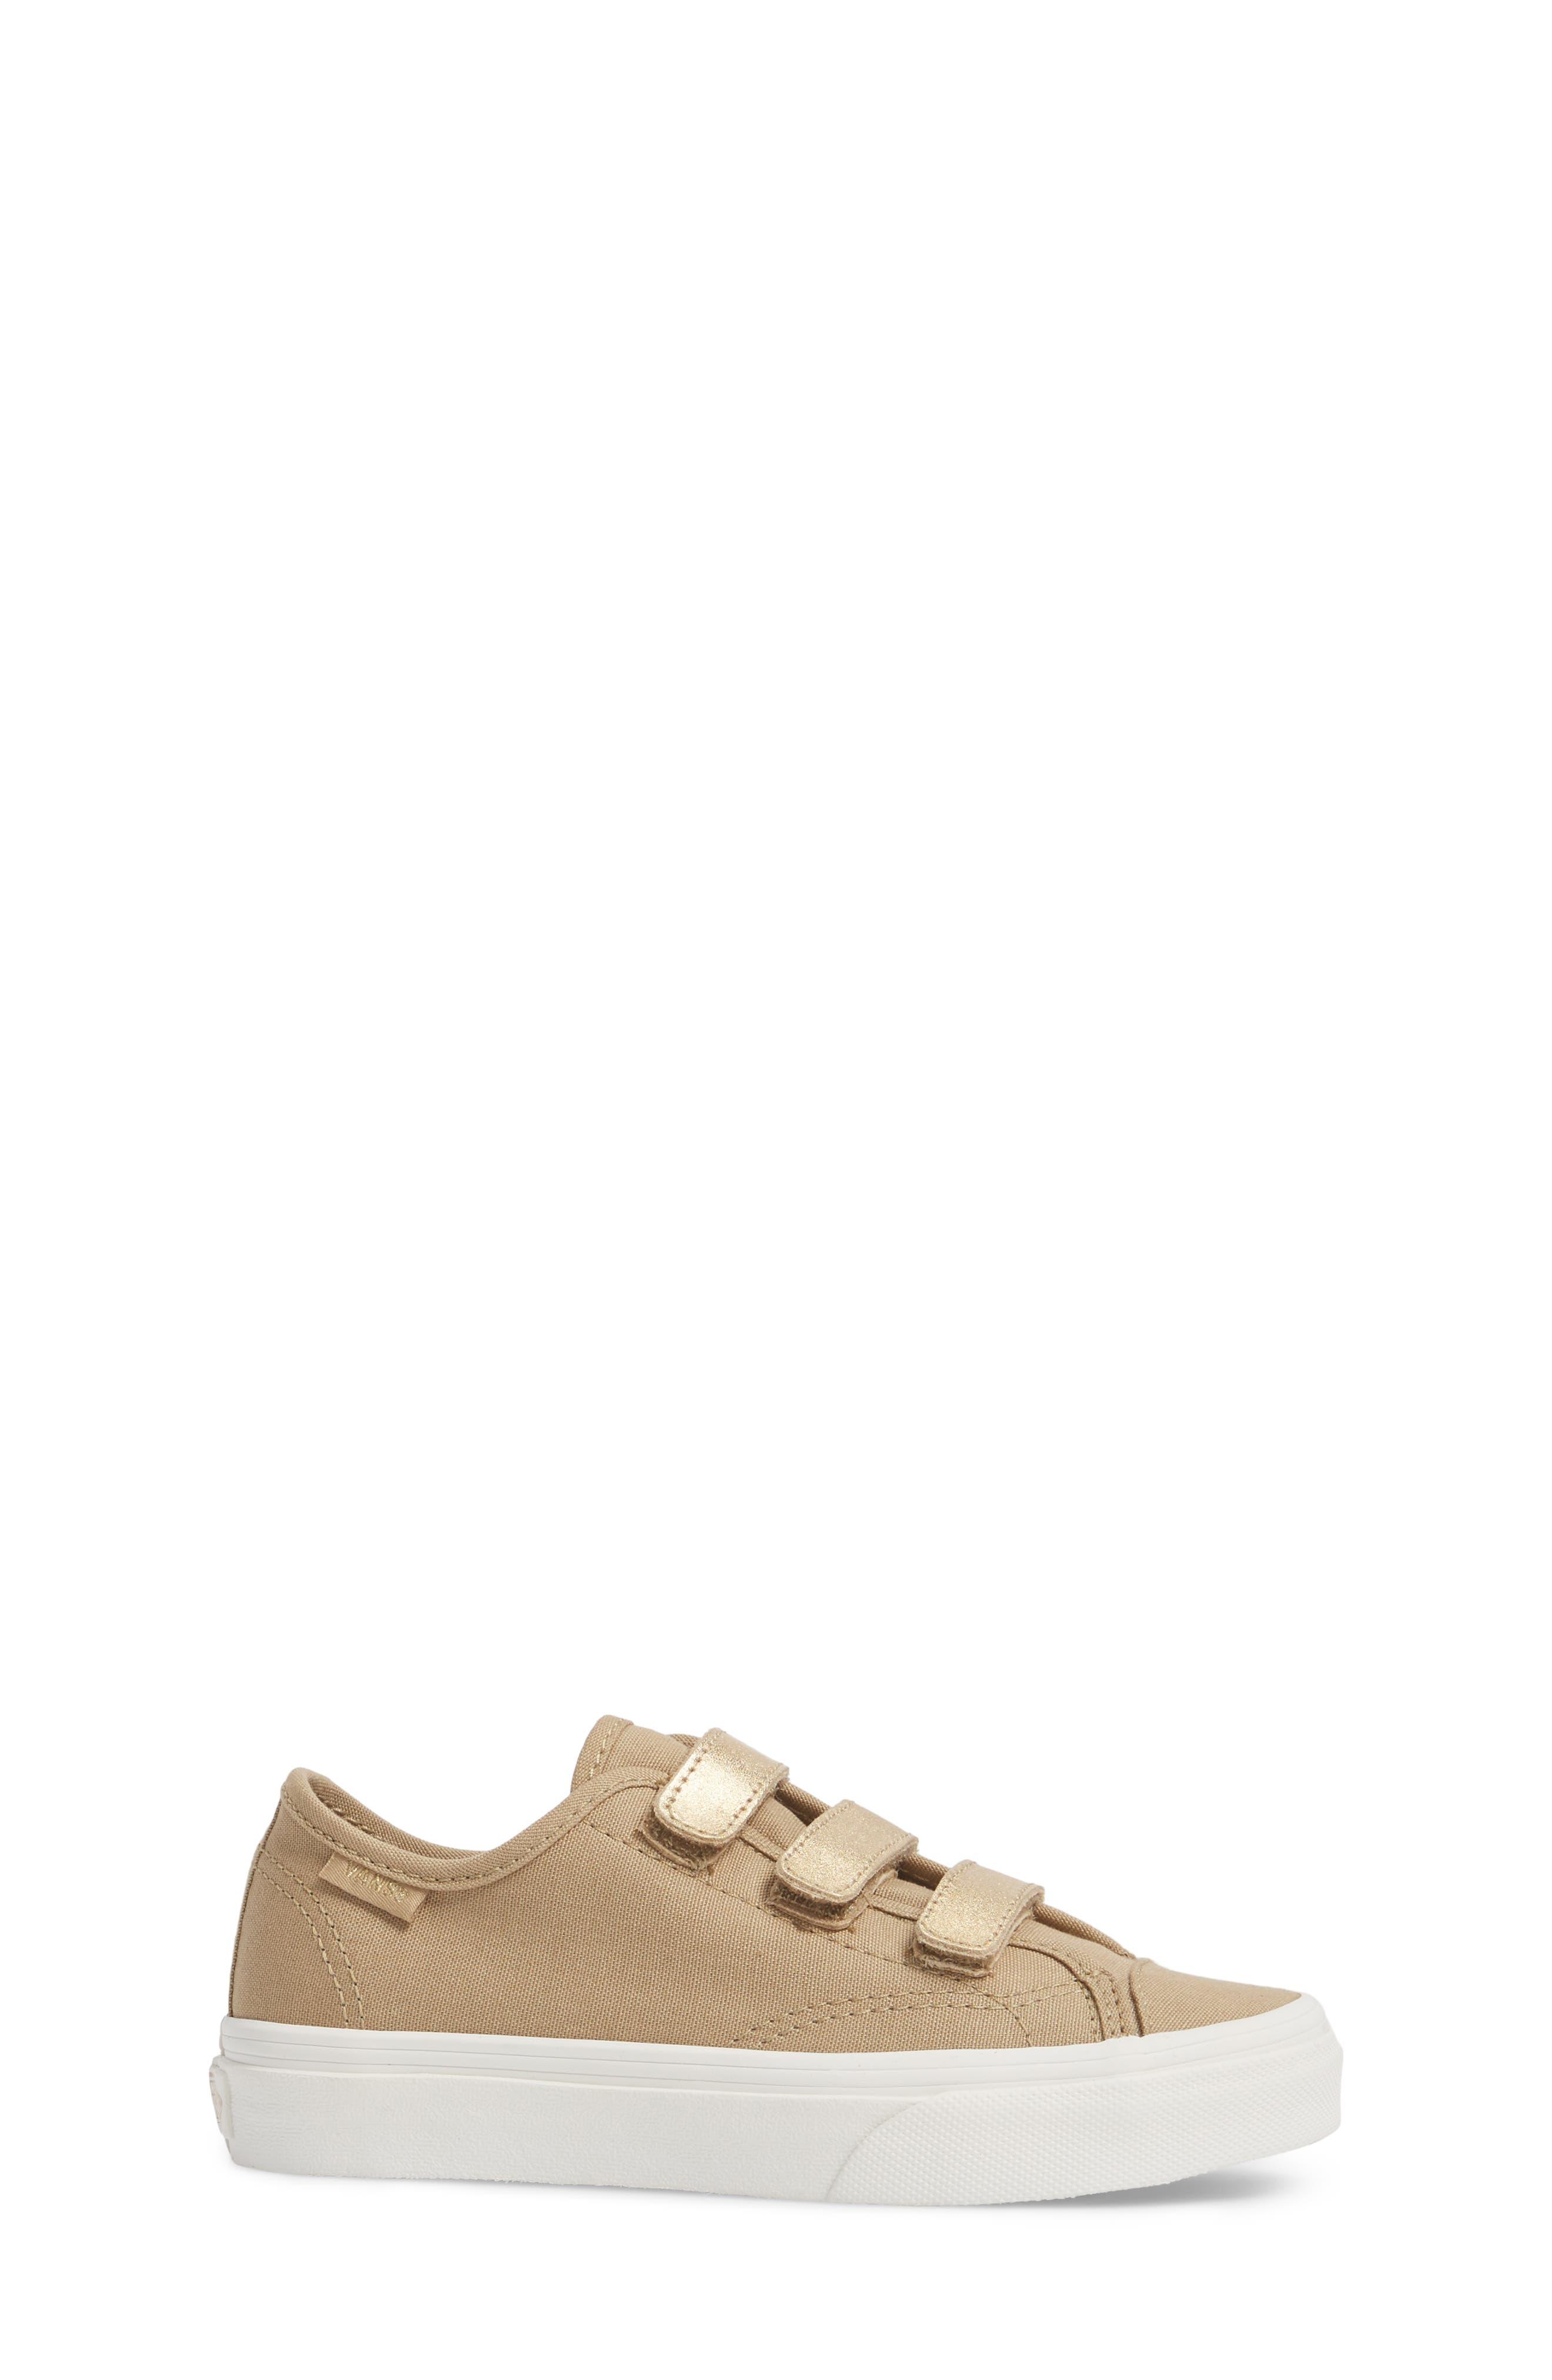 Style 23V Sneaker,                             Alternate thumbnail 3, color,                             Metallic/ Cornstalk